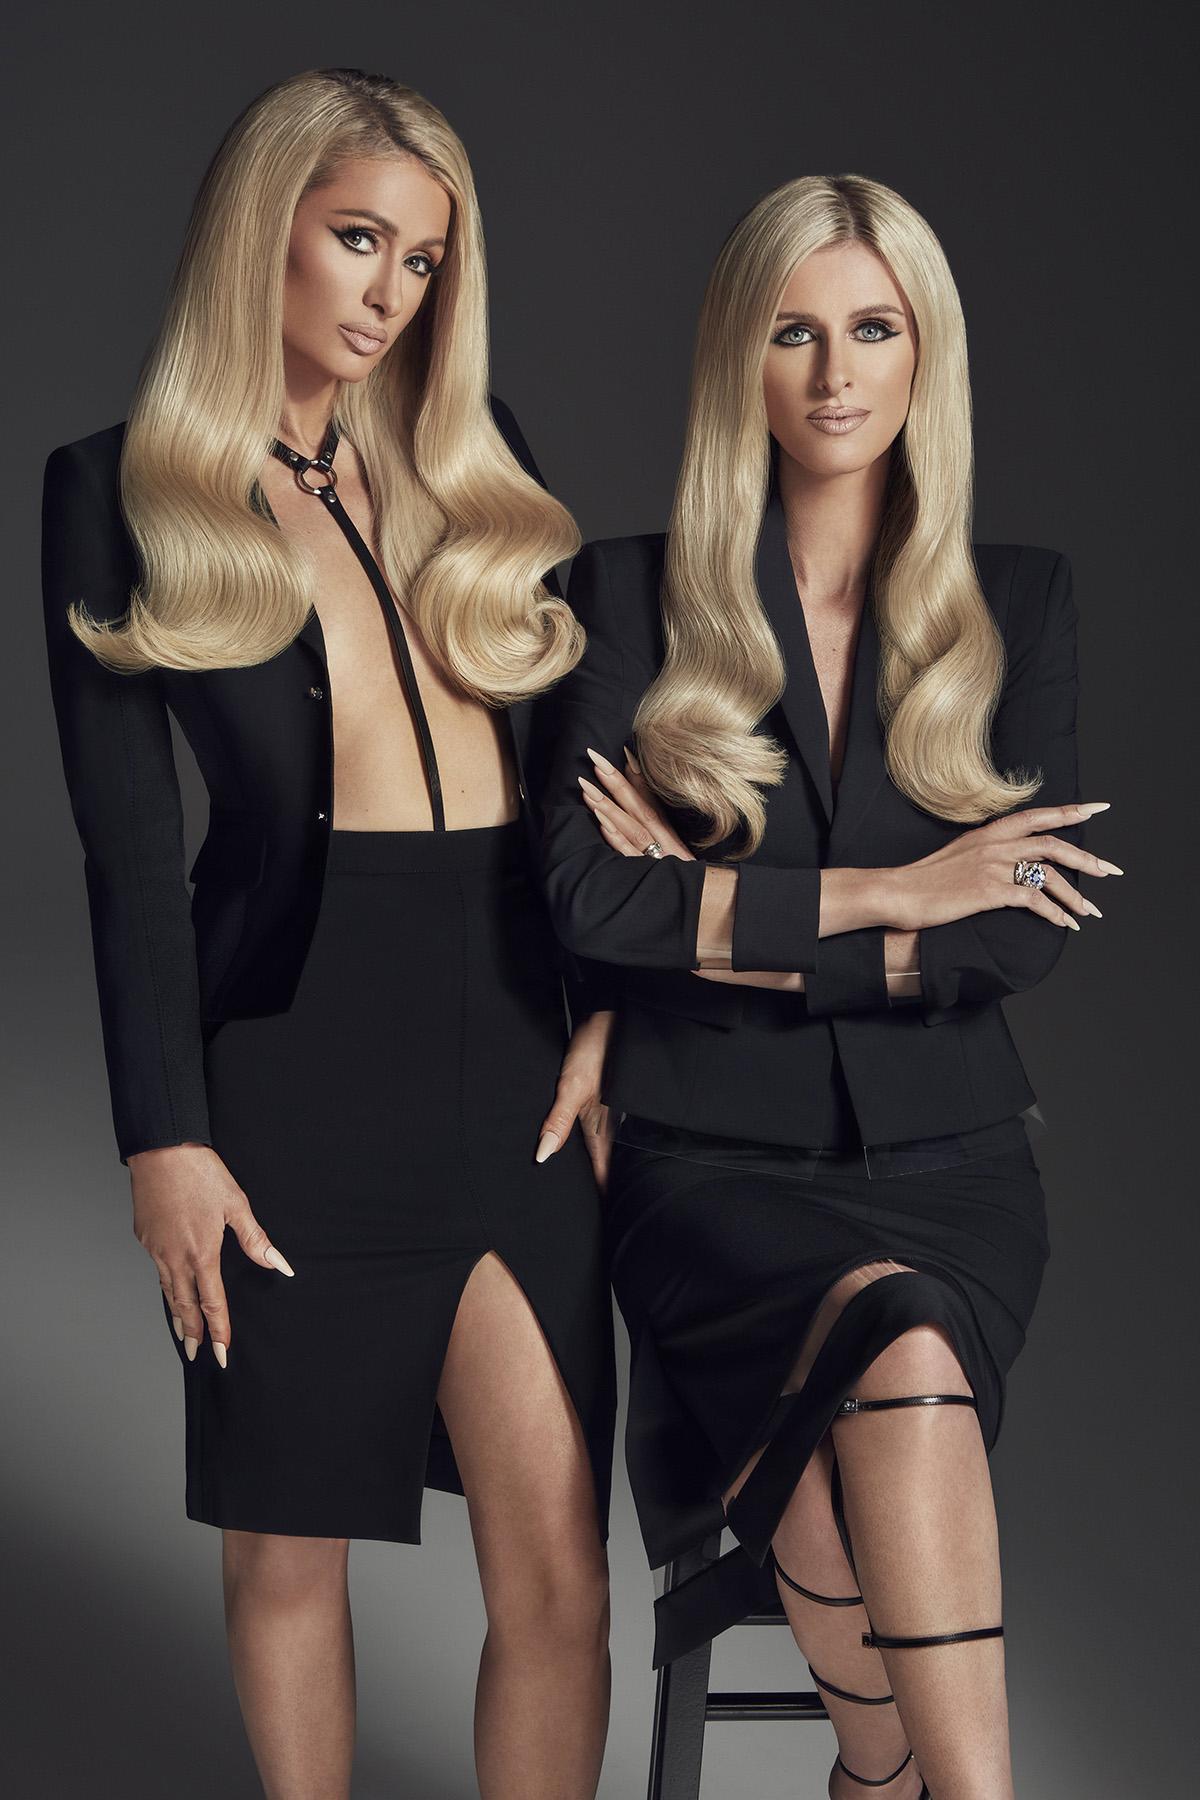 Paris Hilton & Nicky Hilton cover L'Officiel Italia Issue 36 by Vijat Mohindra